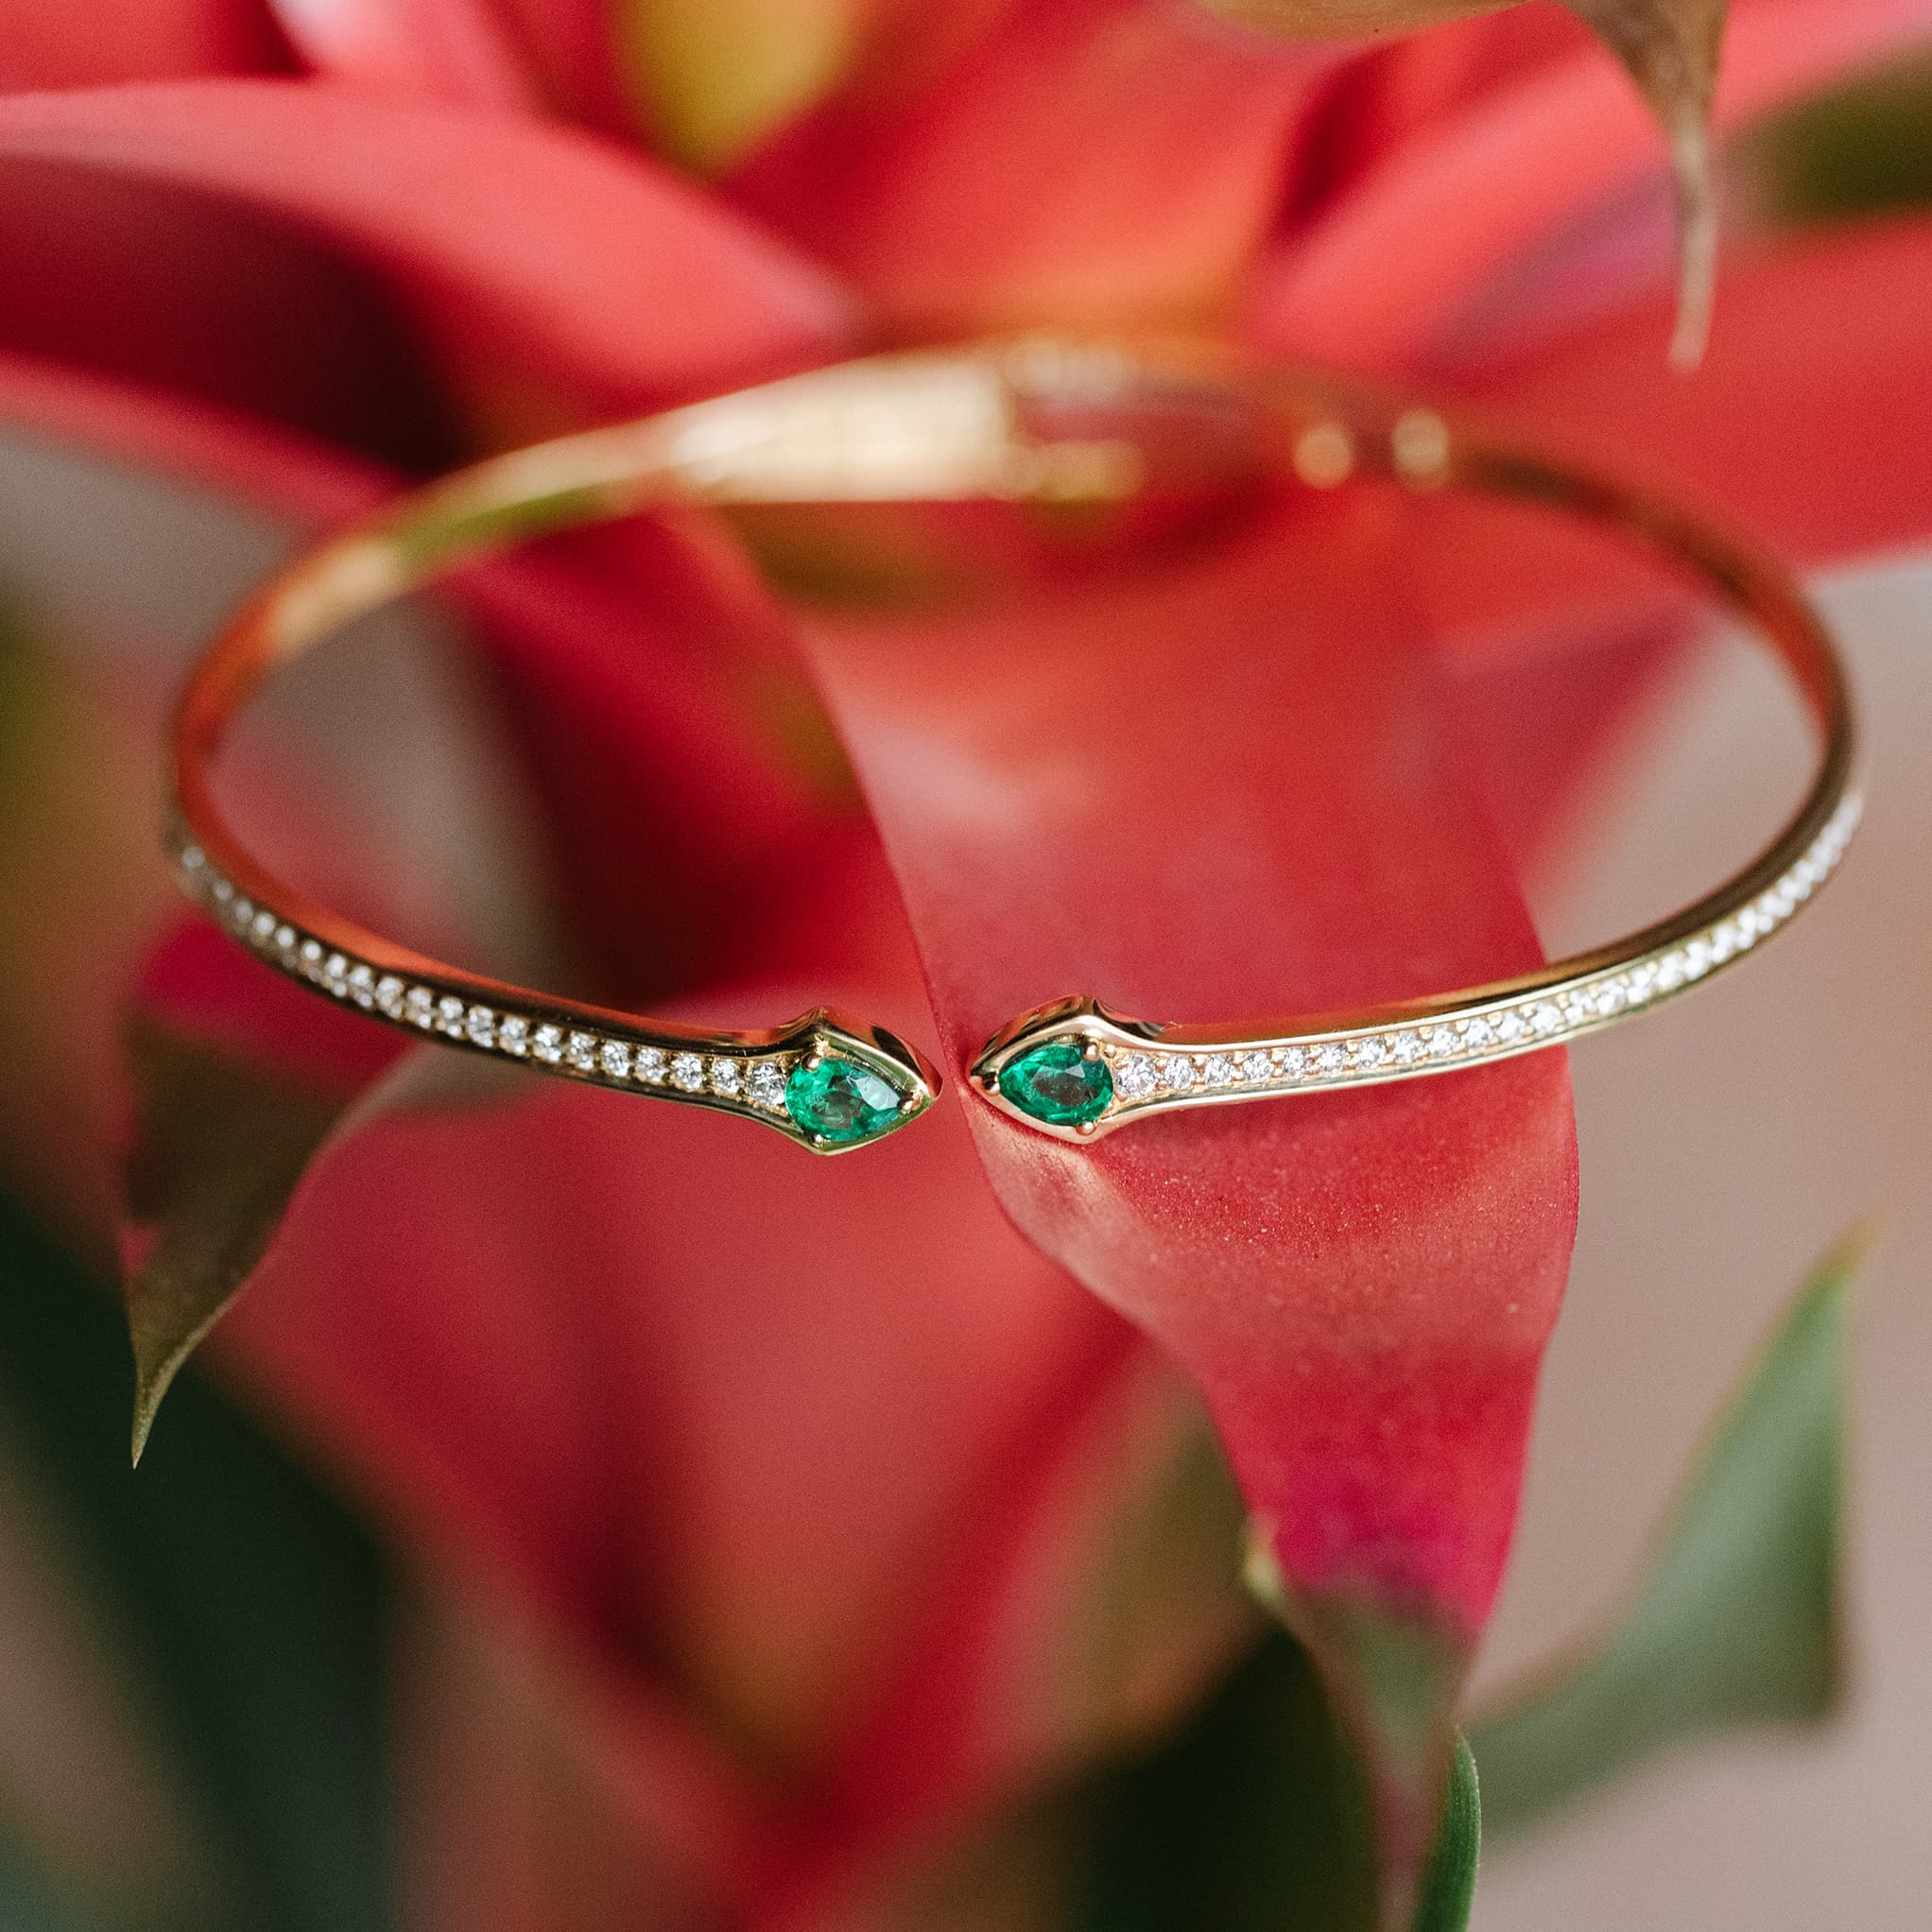 emerald and yellow gold bangle